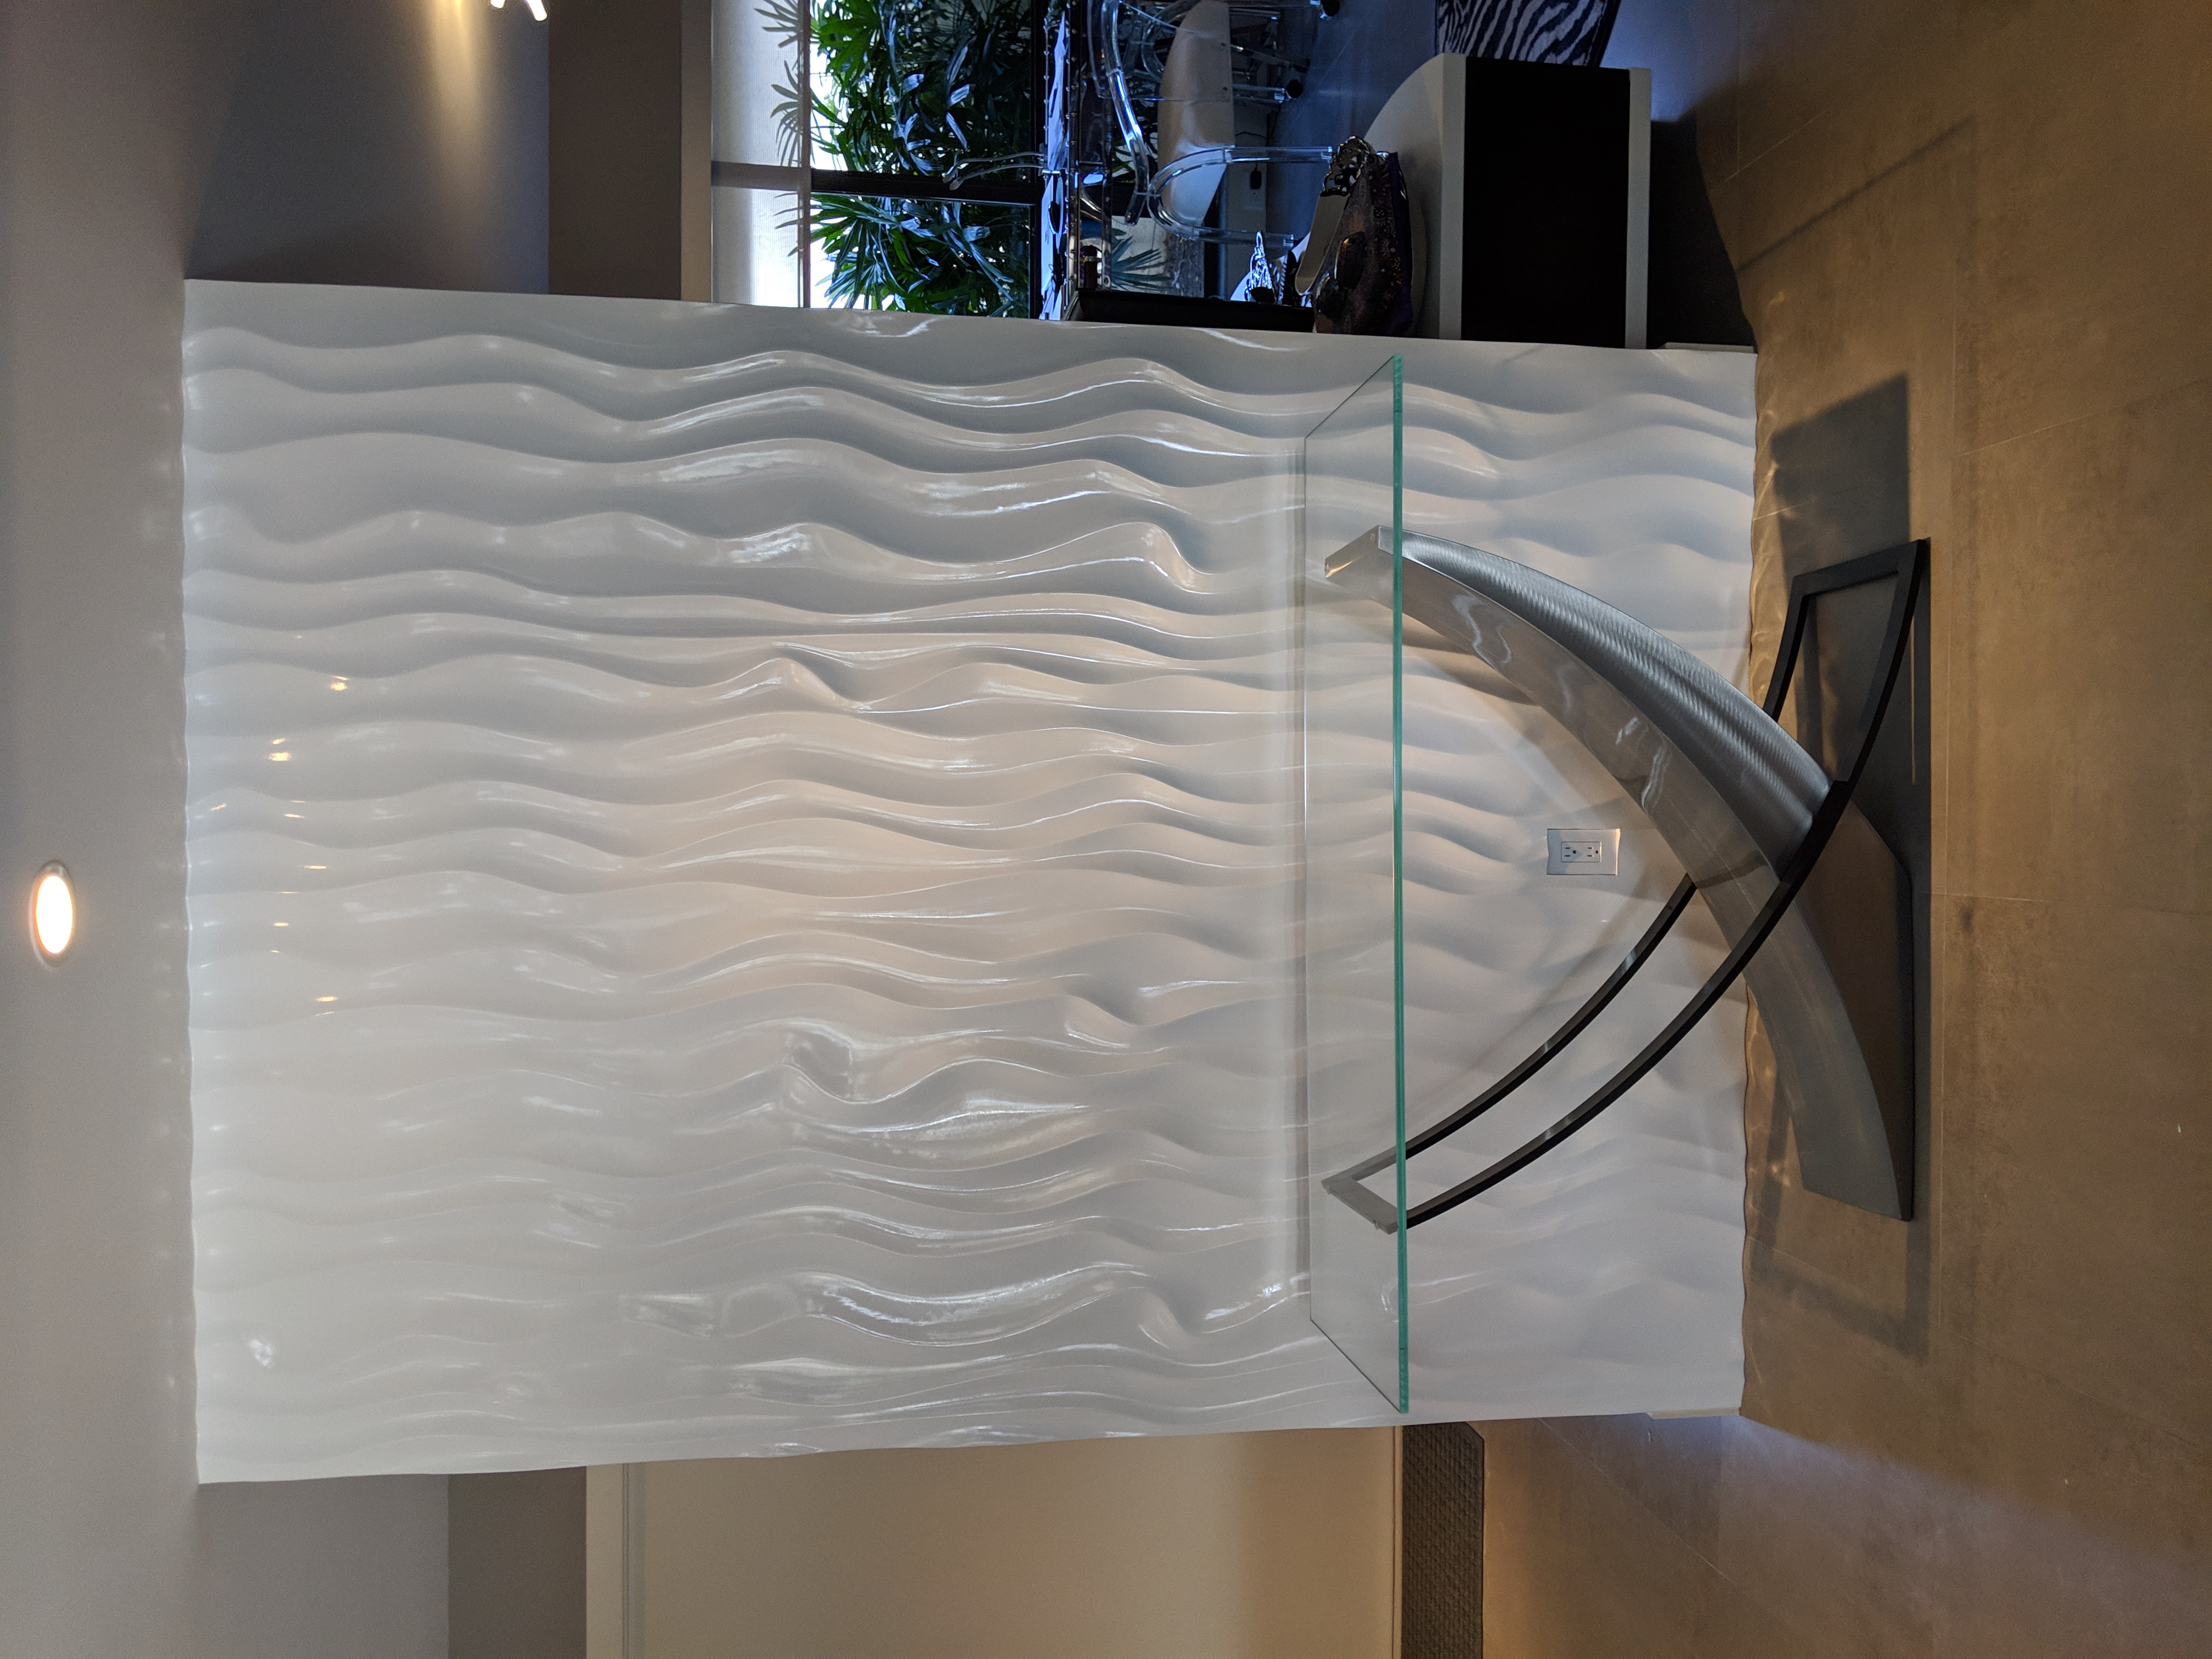 3D Wave wall panels